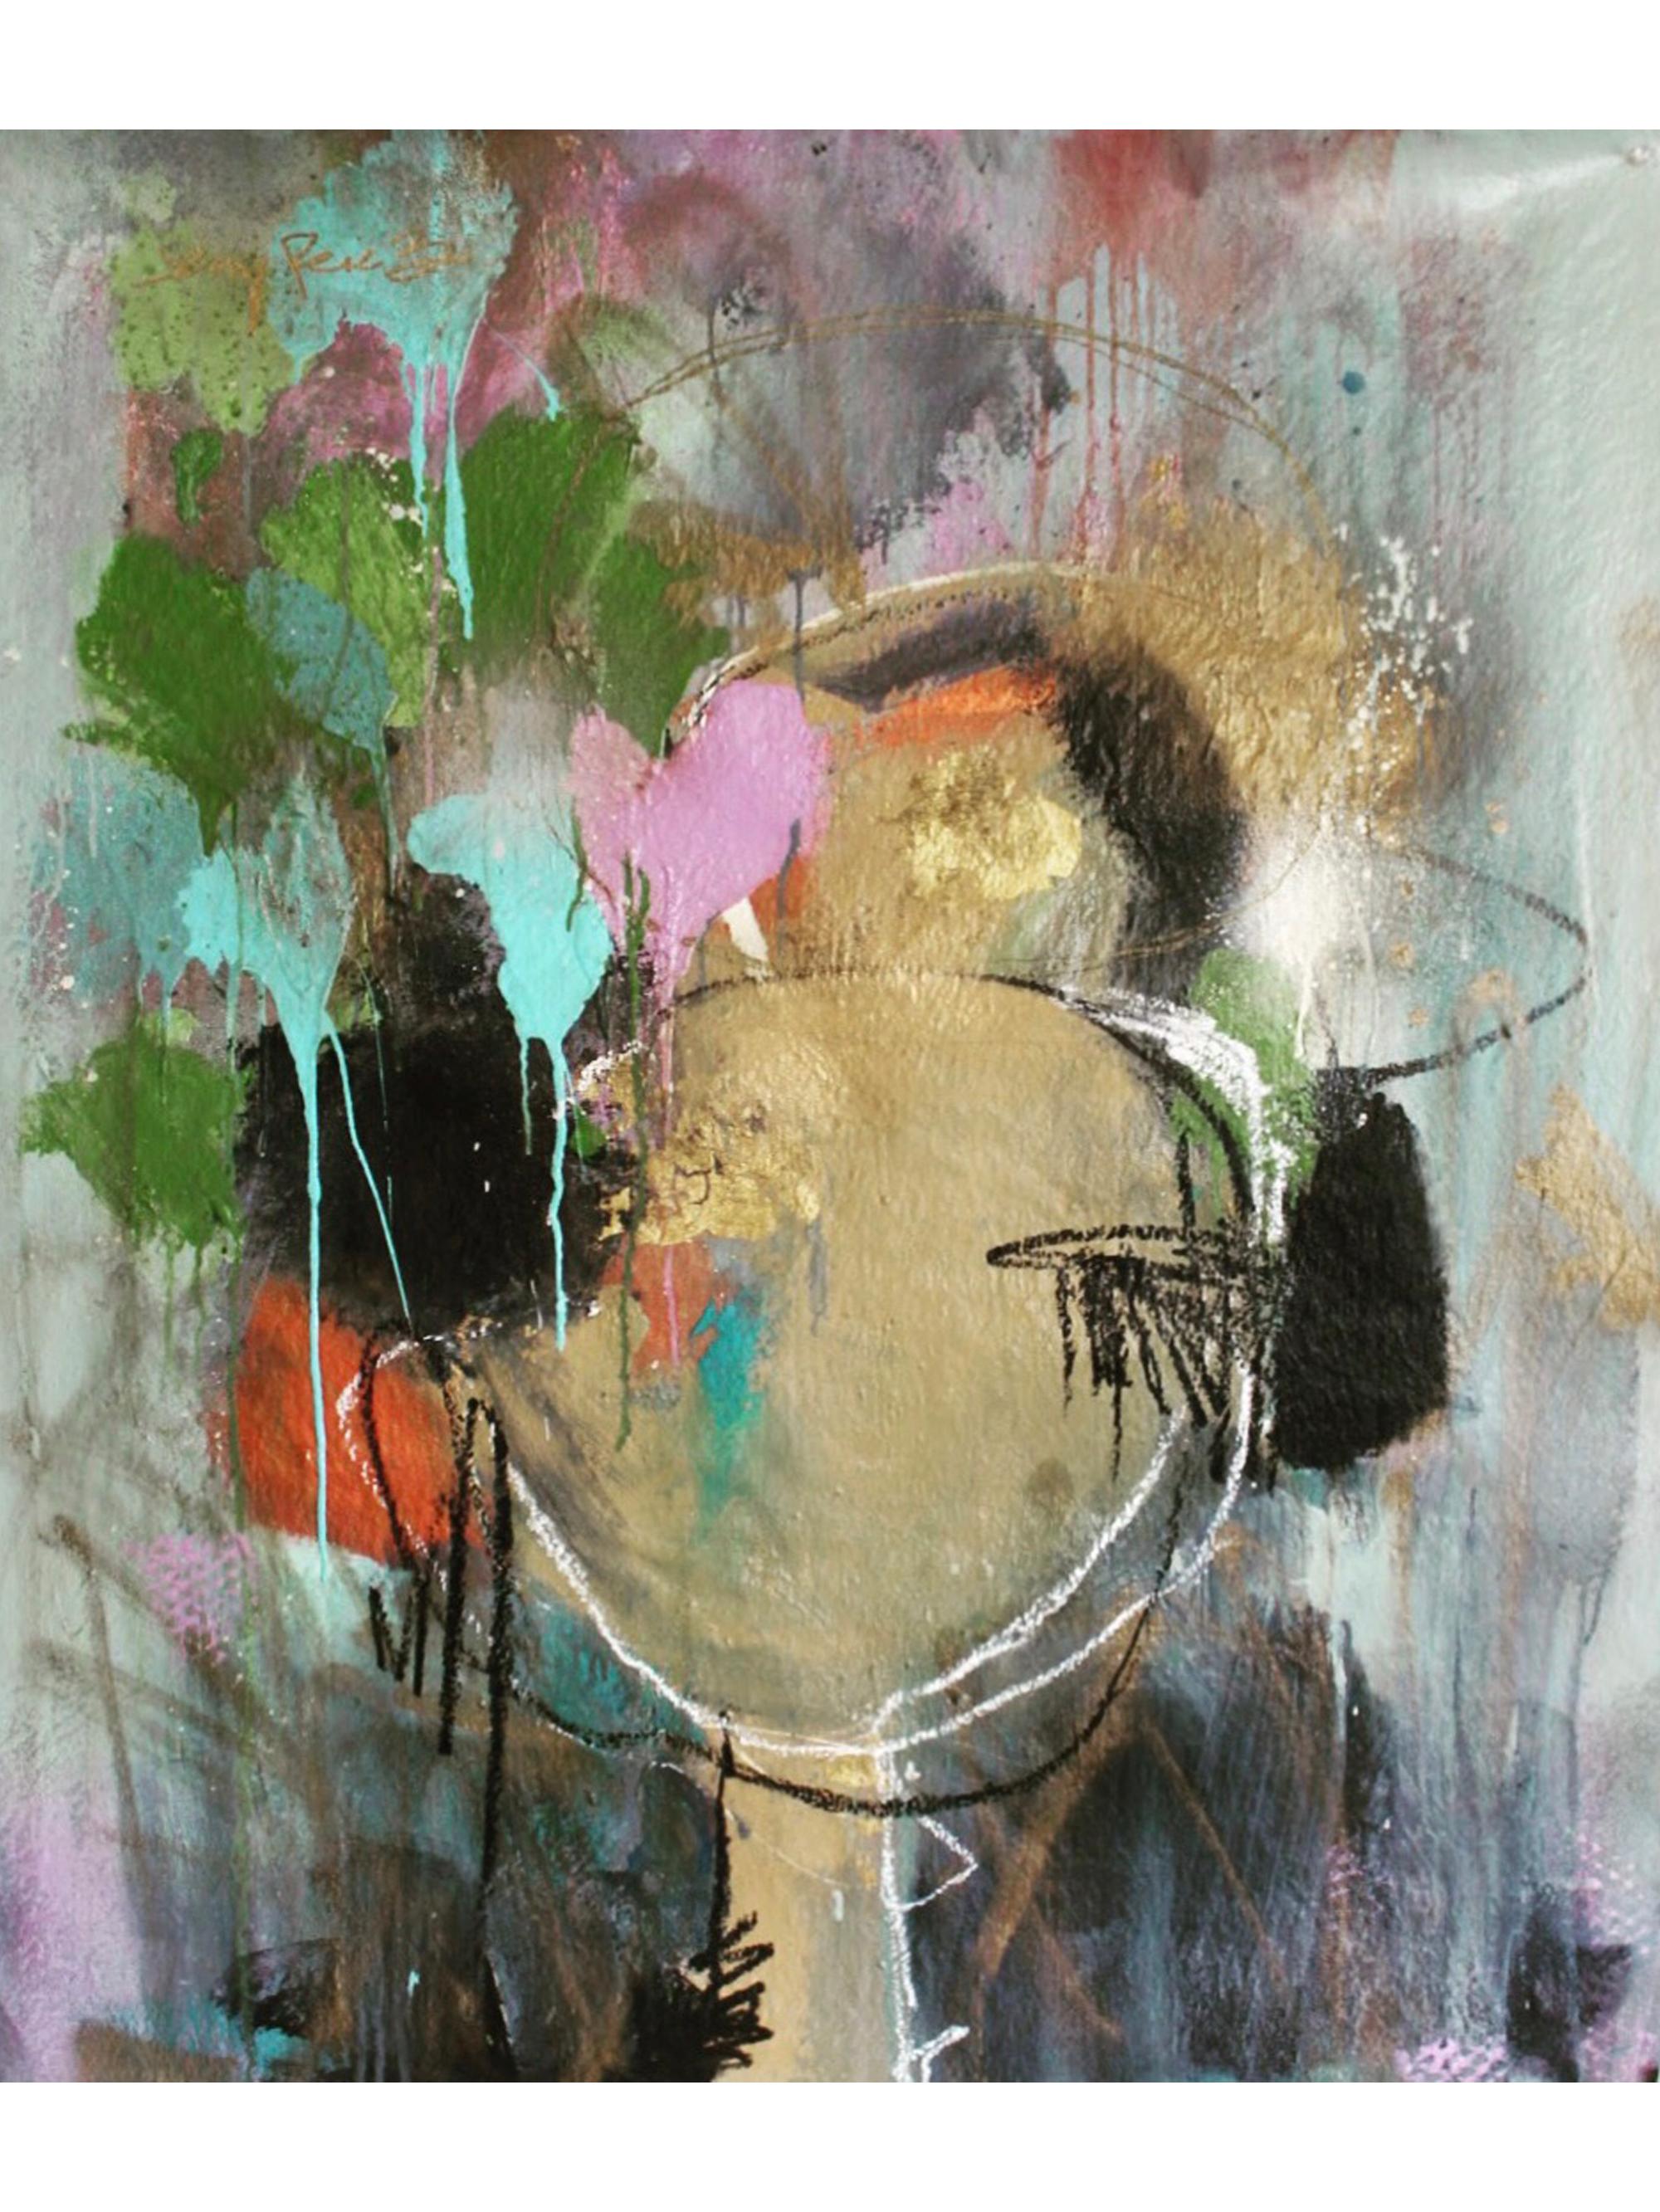 "Dreaming Awake - 44"" x 38"" Acrylic, aerosol and oil stick on canvas, 2018"